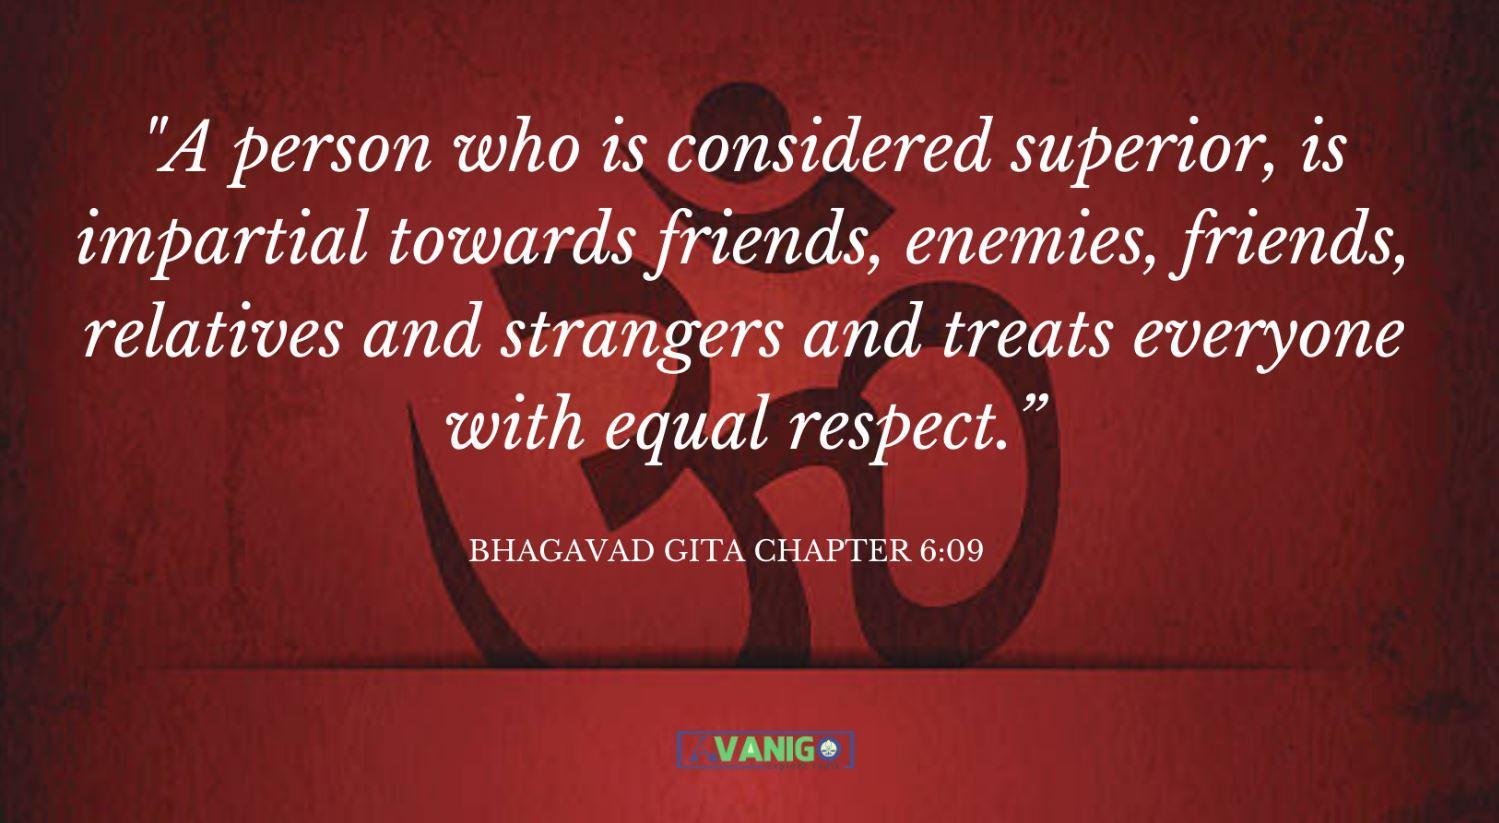 Bhagvad Gita Chapter 6:09